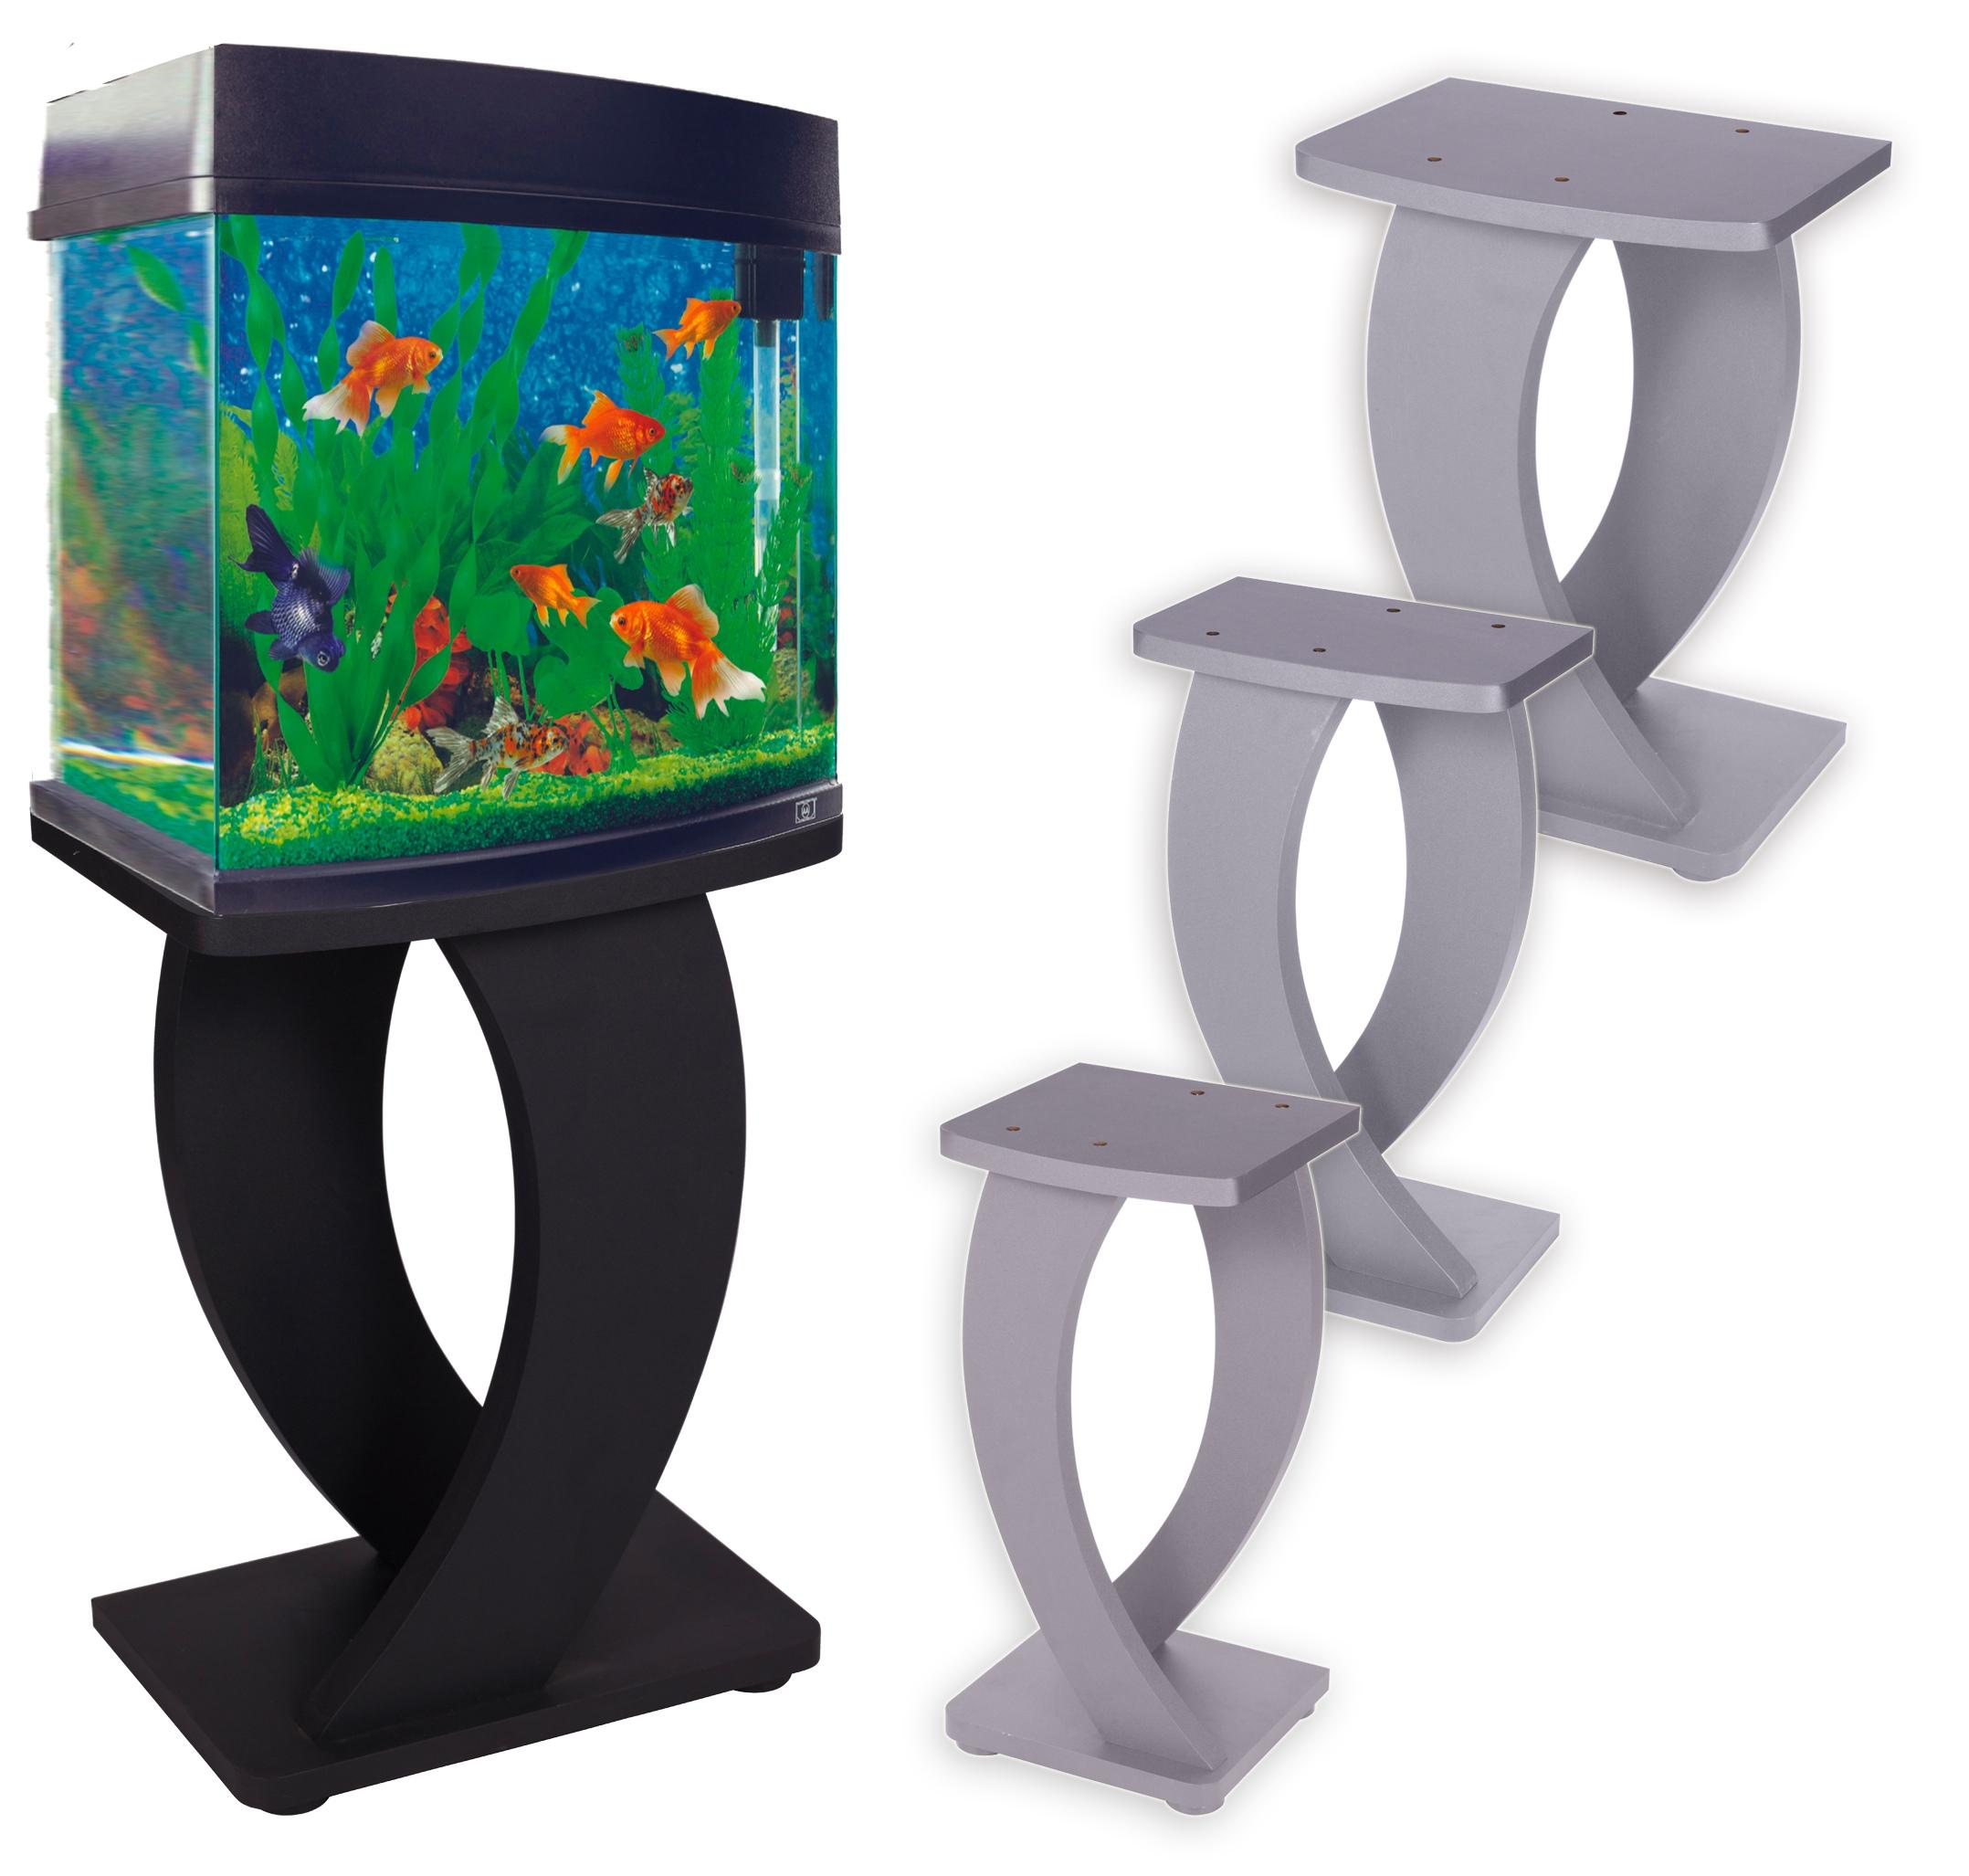 Wooden Mdf Aquarium Fish Tank Stand Black Silver Large Medium Small